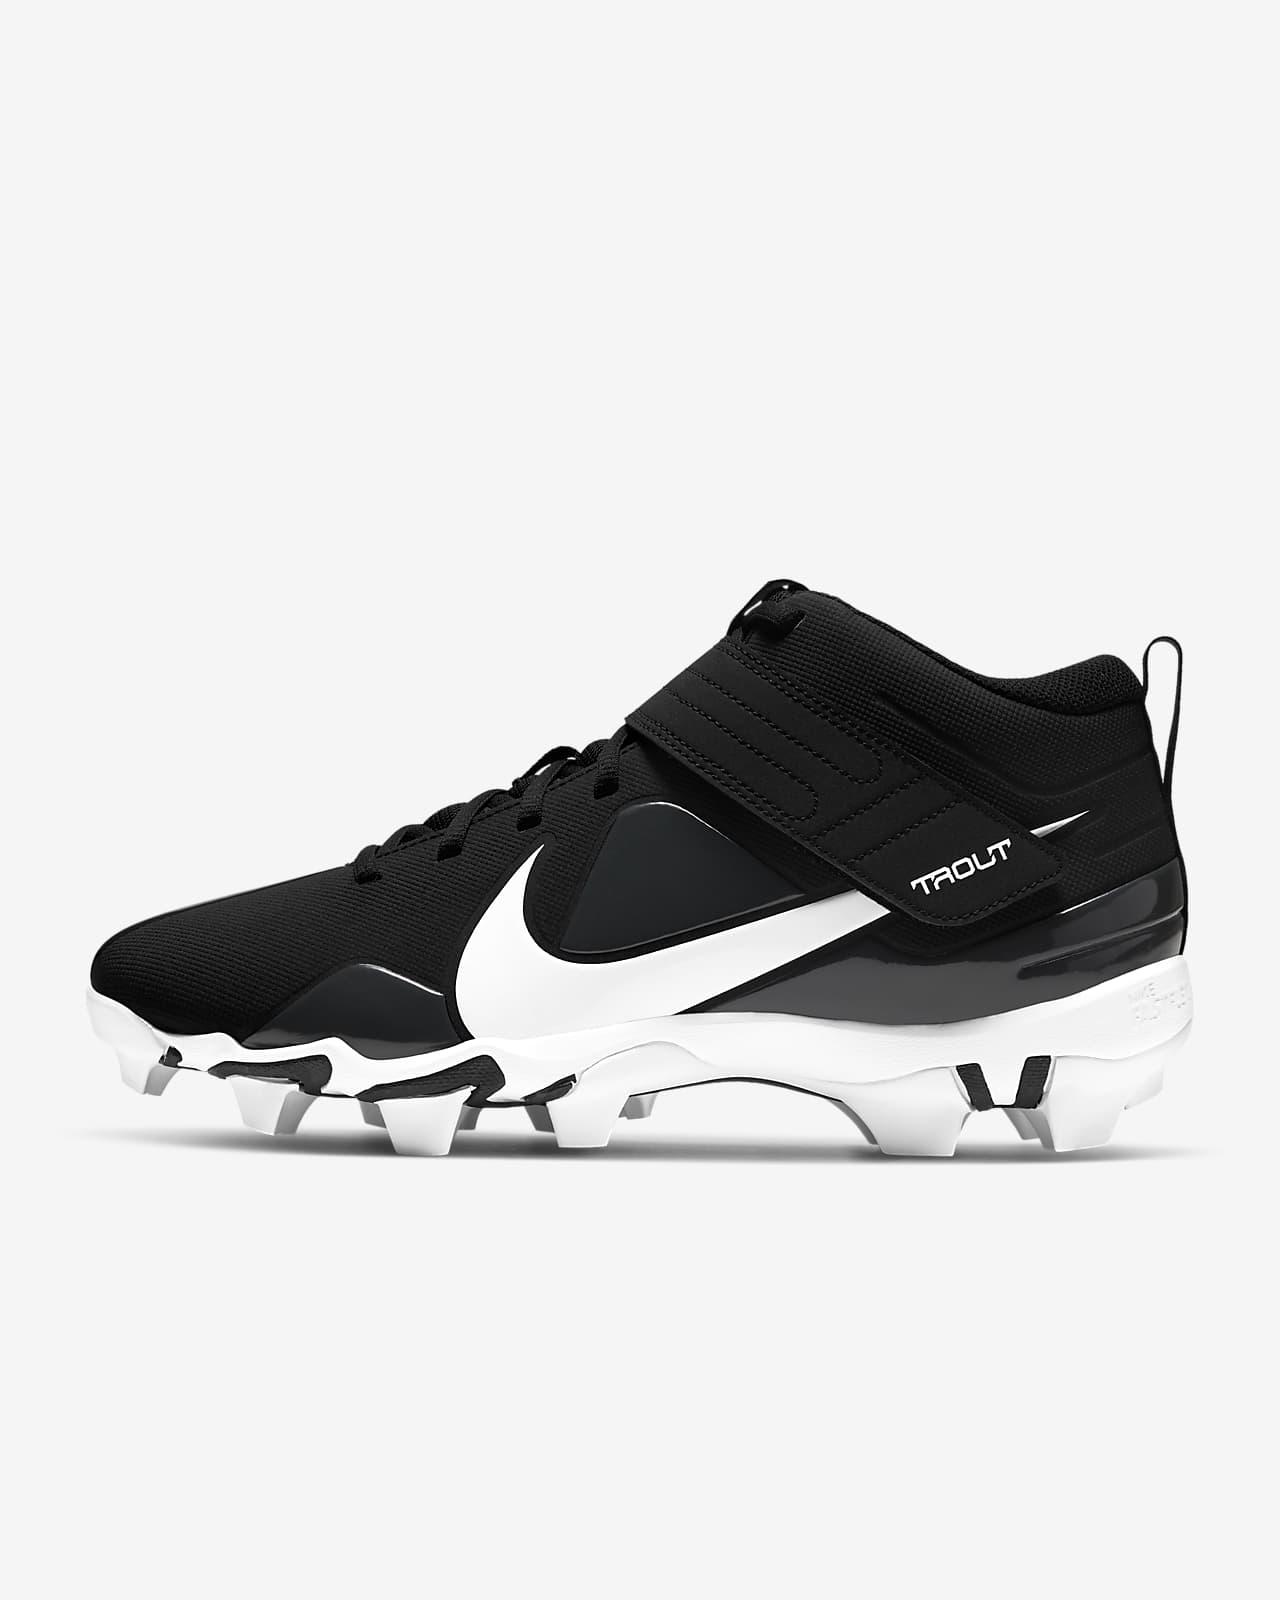 Nike Force Trout 7 Keystone Men's Baseball Cleat